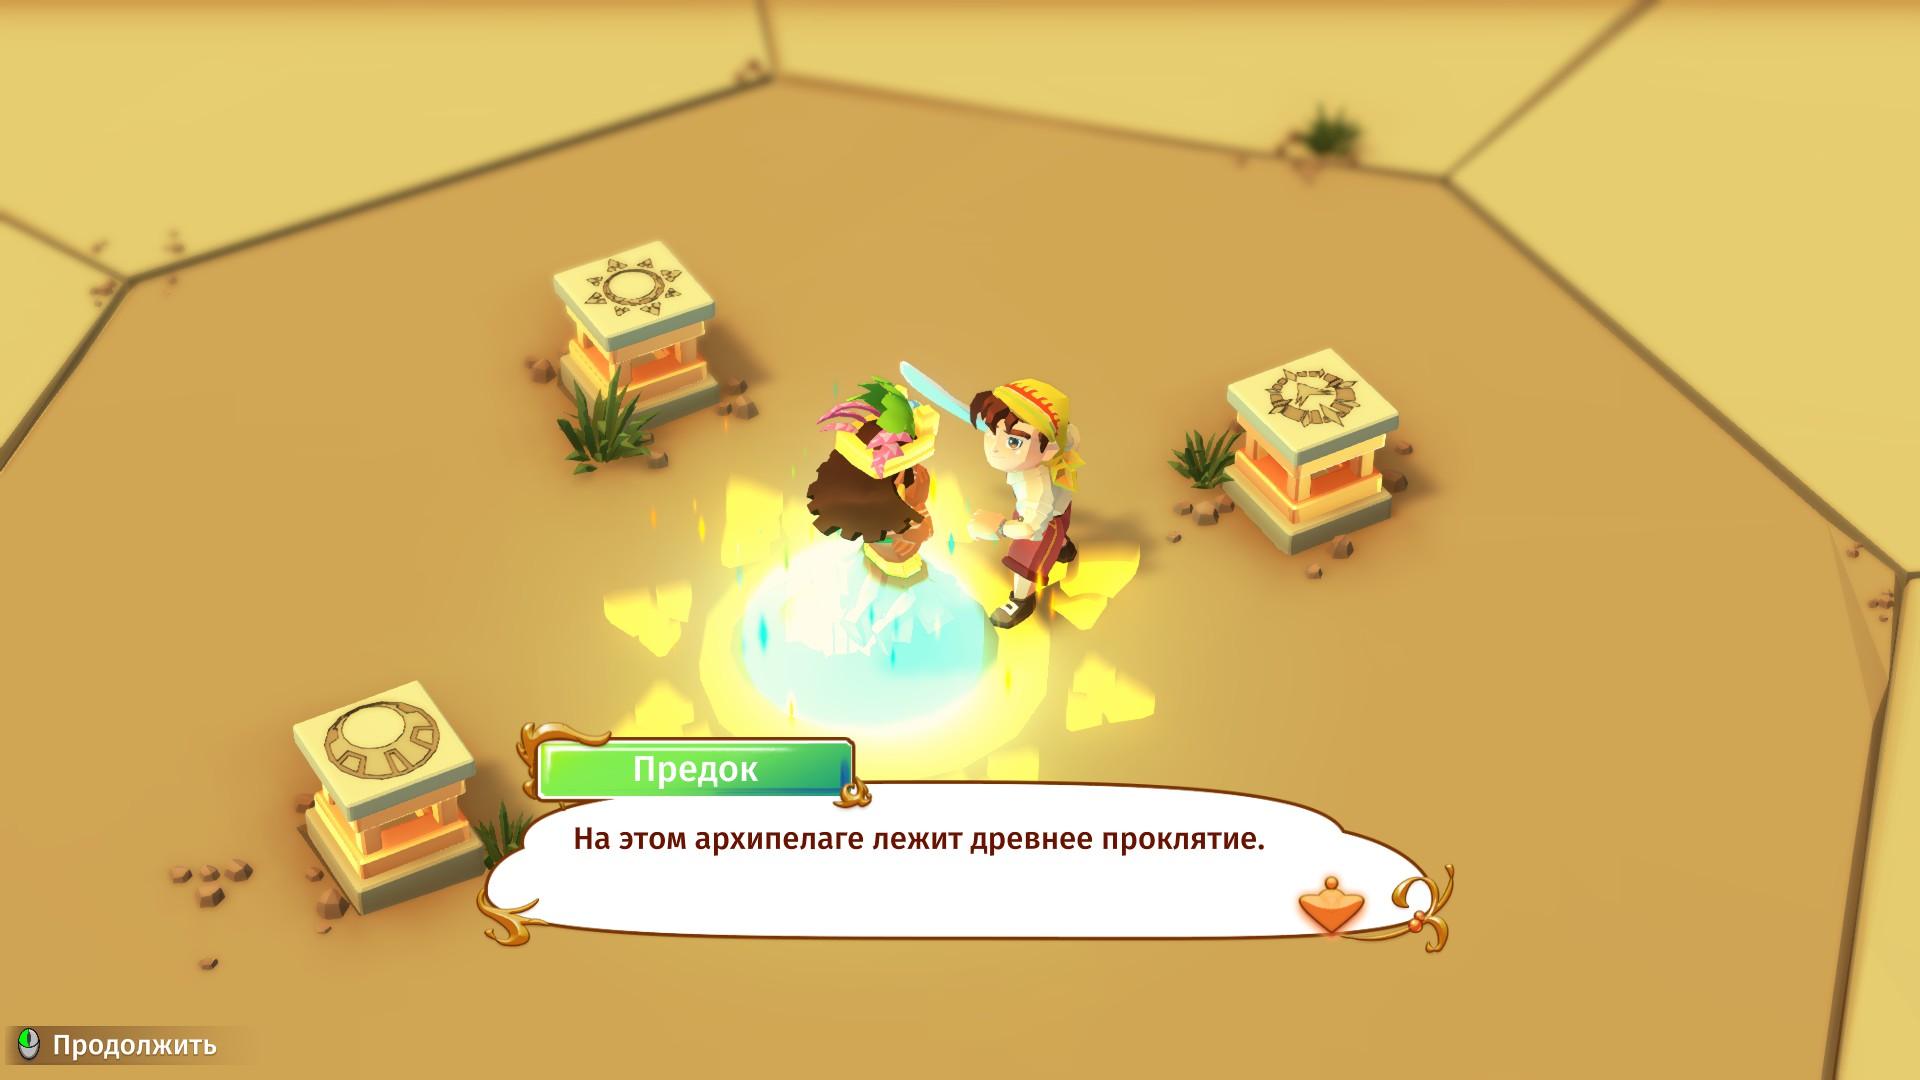 qE2J1ZDyYsw game art logo